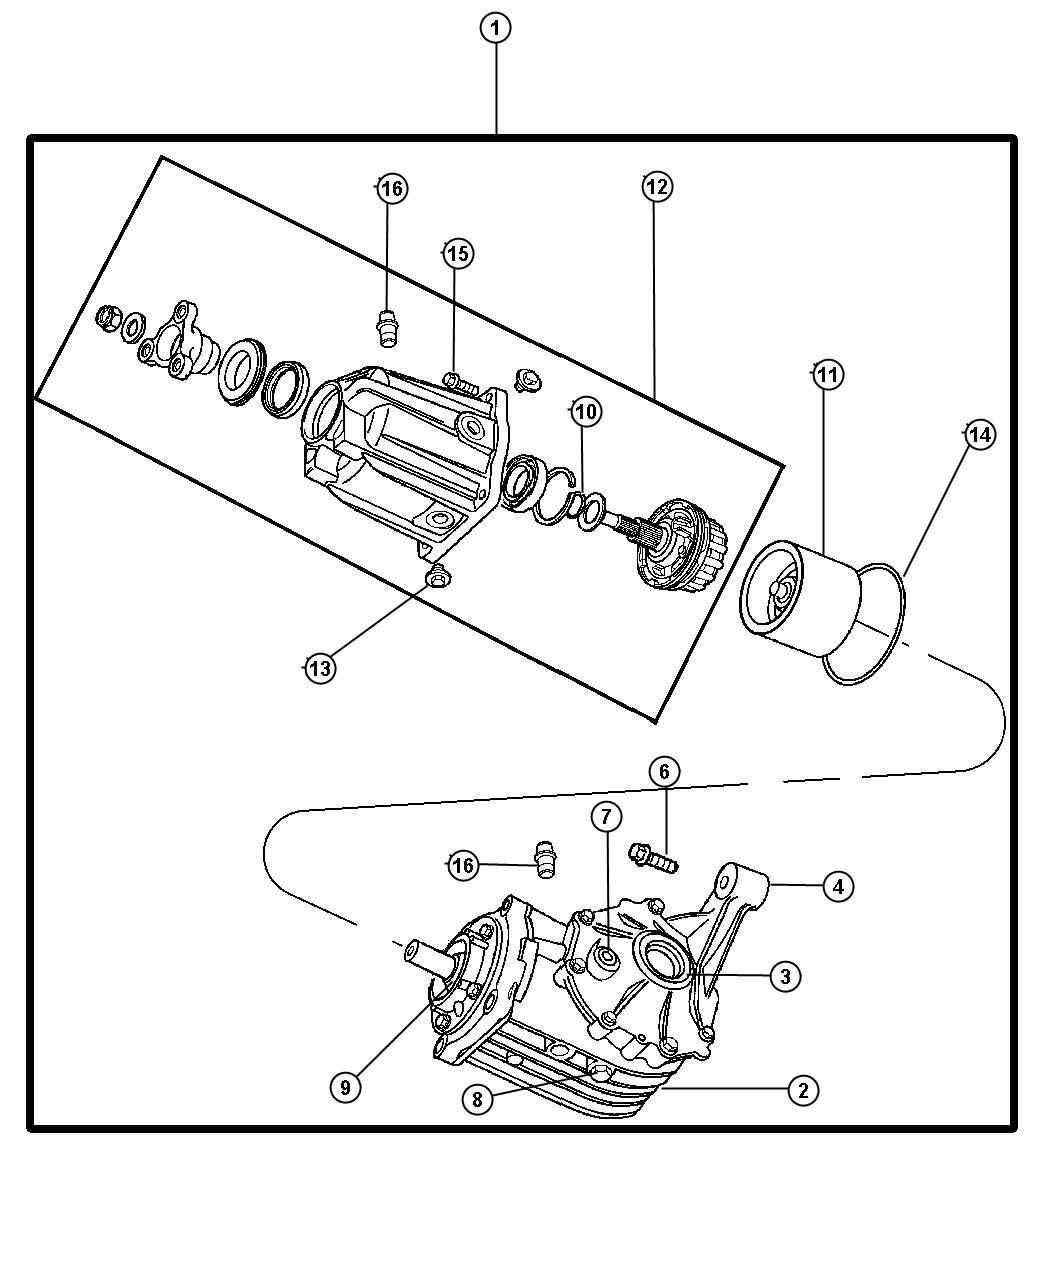 hight resolution of chrysler pacifica rear suspension imageresizertool com 1999 chrysler sebring ignition wiring diagram 1999 chrysler sebring radio